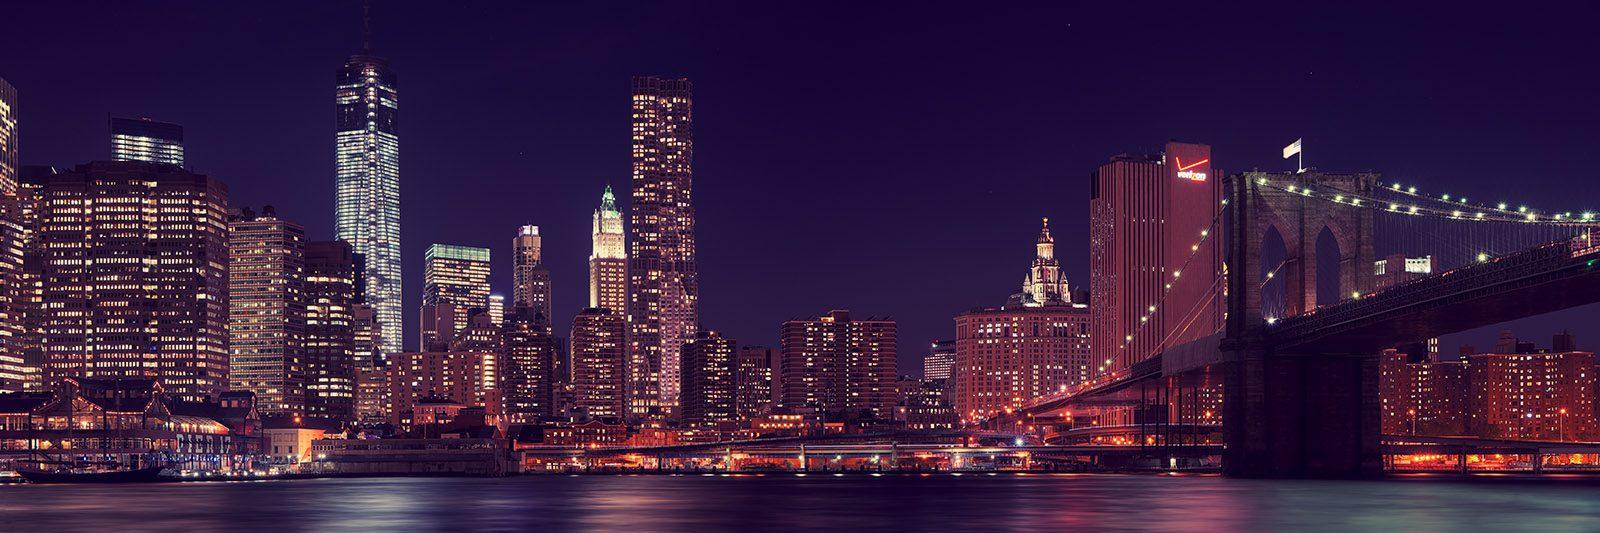 Manhattan night time av Peder Aaserud Eikeland